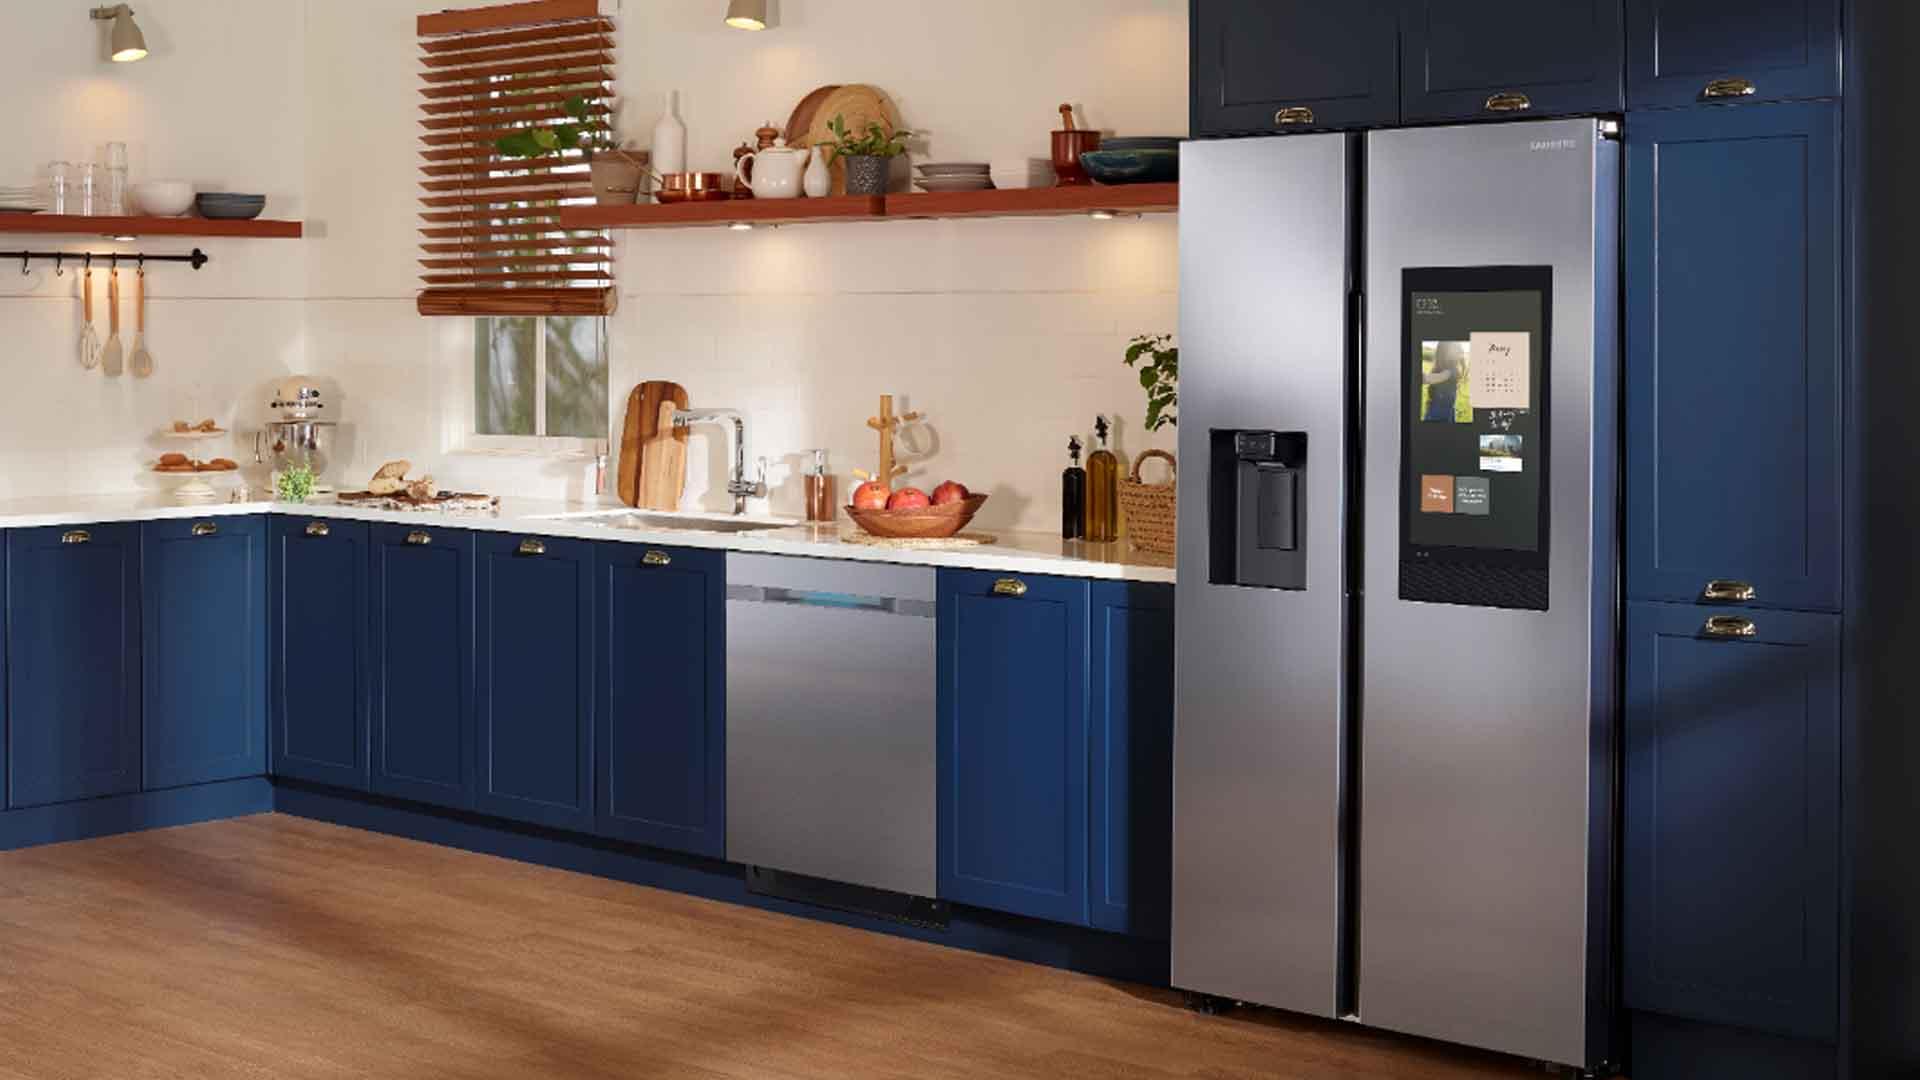 Samsung Refrigerator Repair | Samsung Appliance Repairs